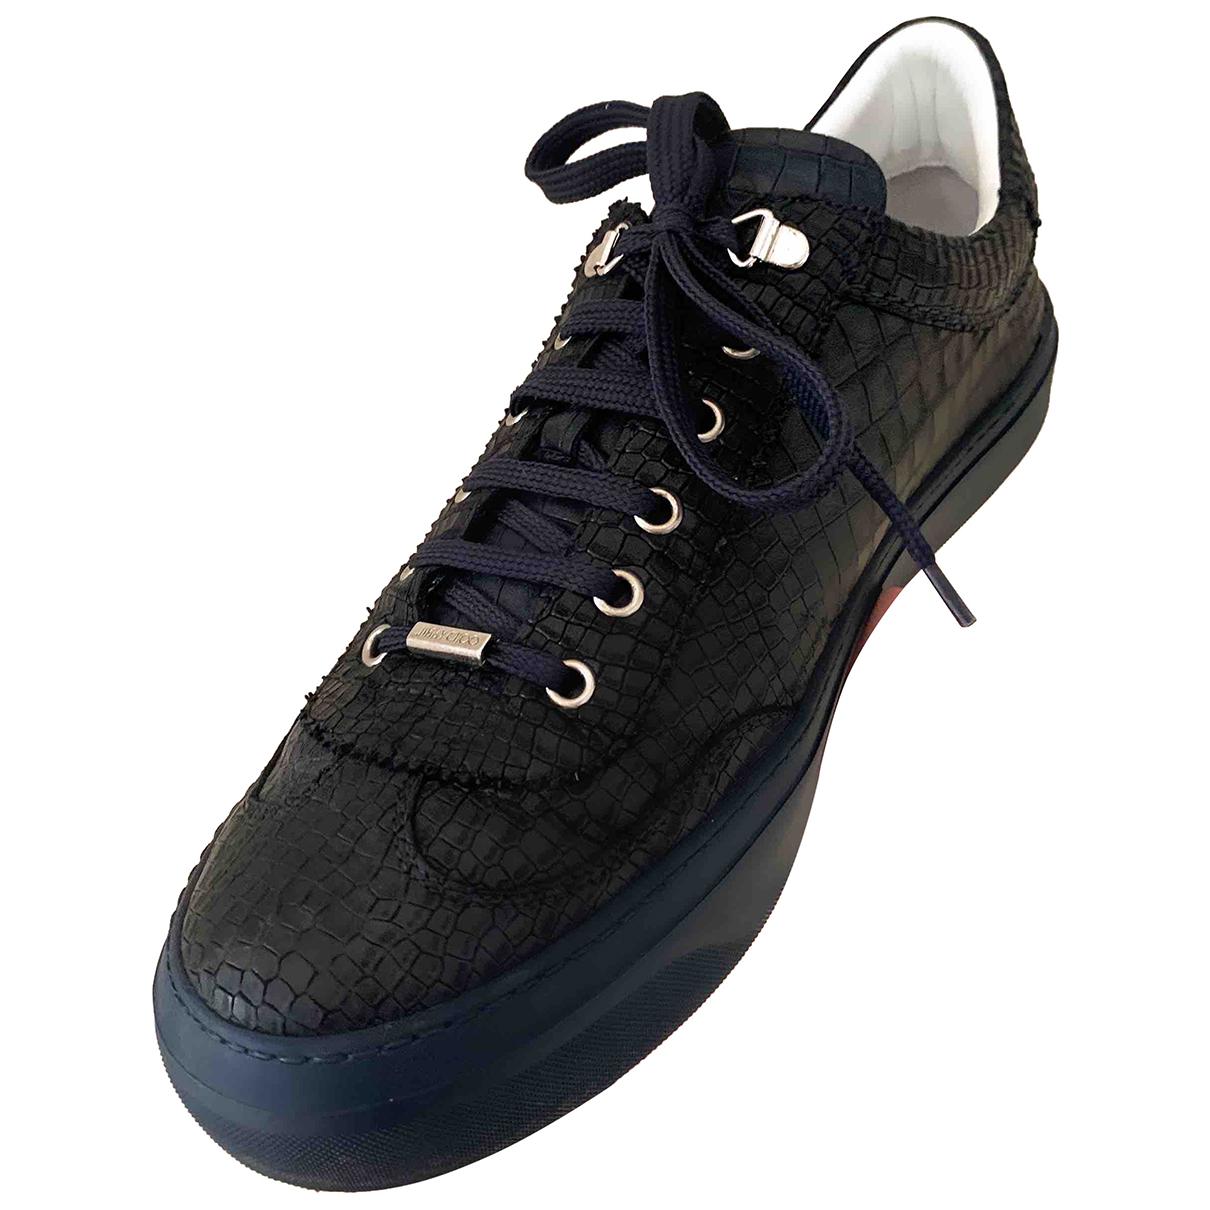 Jimmy Choo N Blue Leather Trainers for Men 43.5 EU